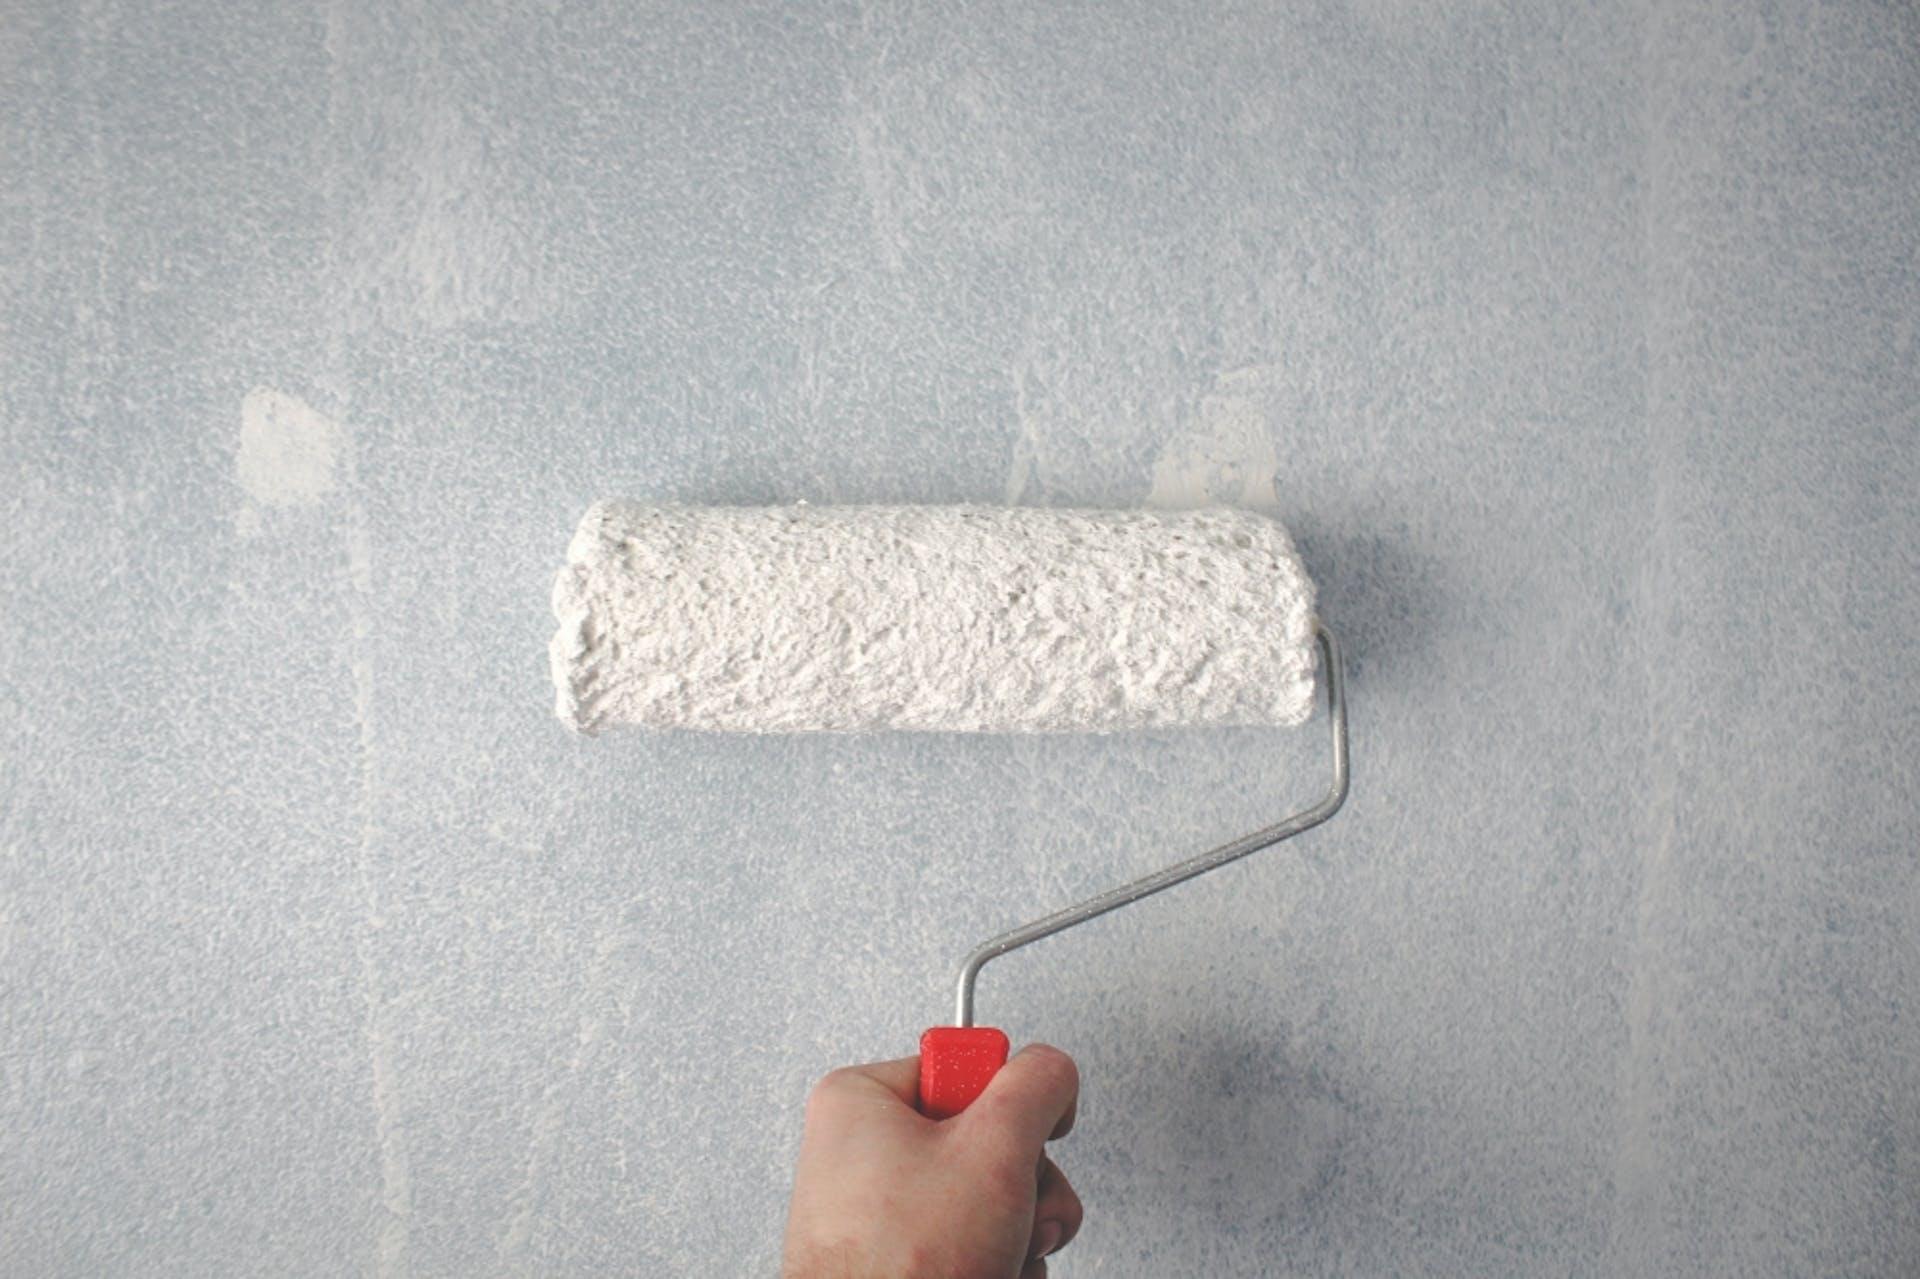 Colores para paredes: descubre las tonalidades que le darán un estilo único a tus espacios favoritos.